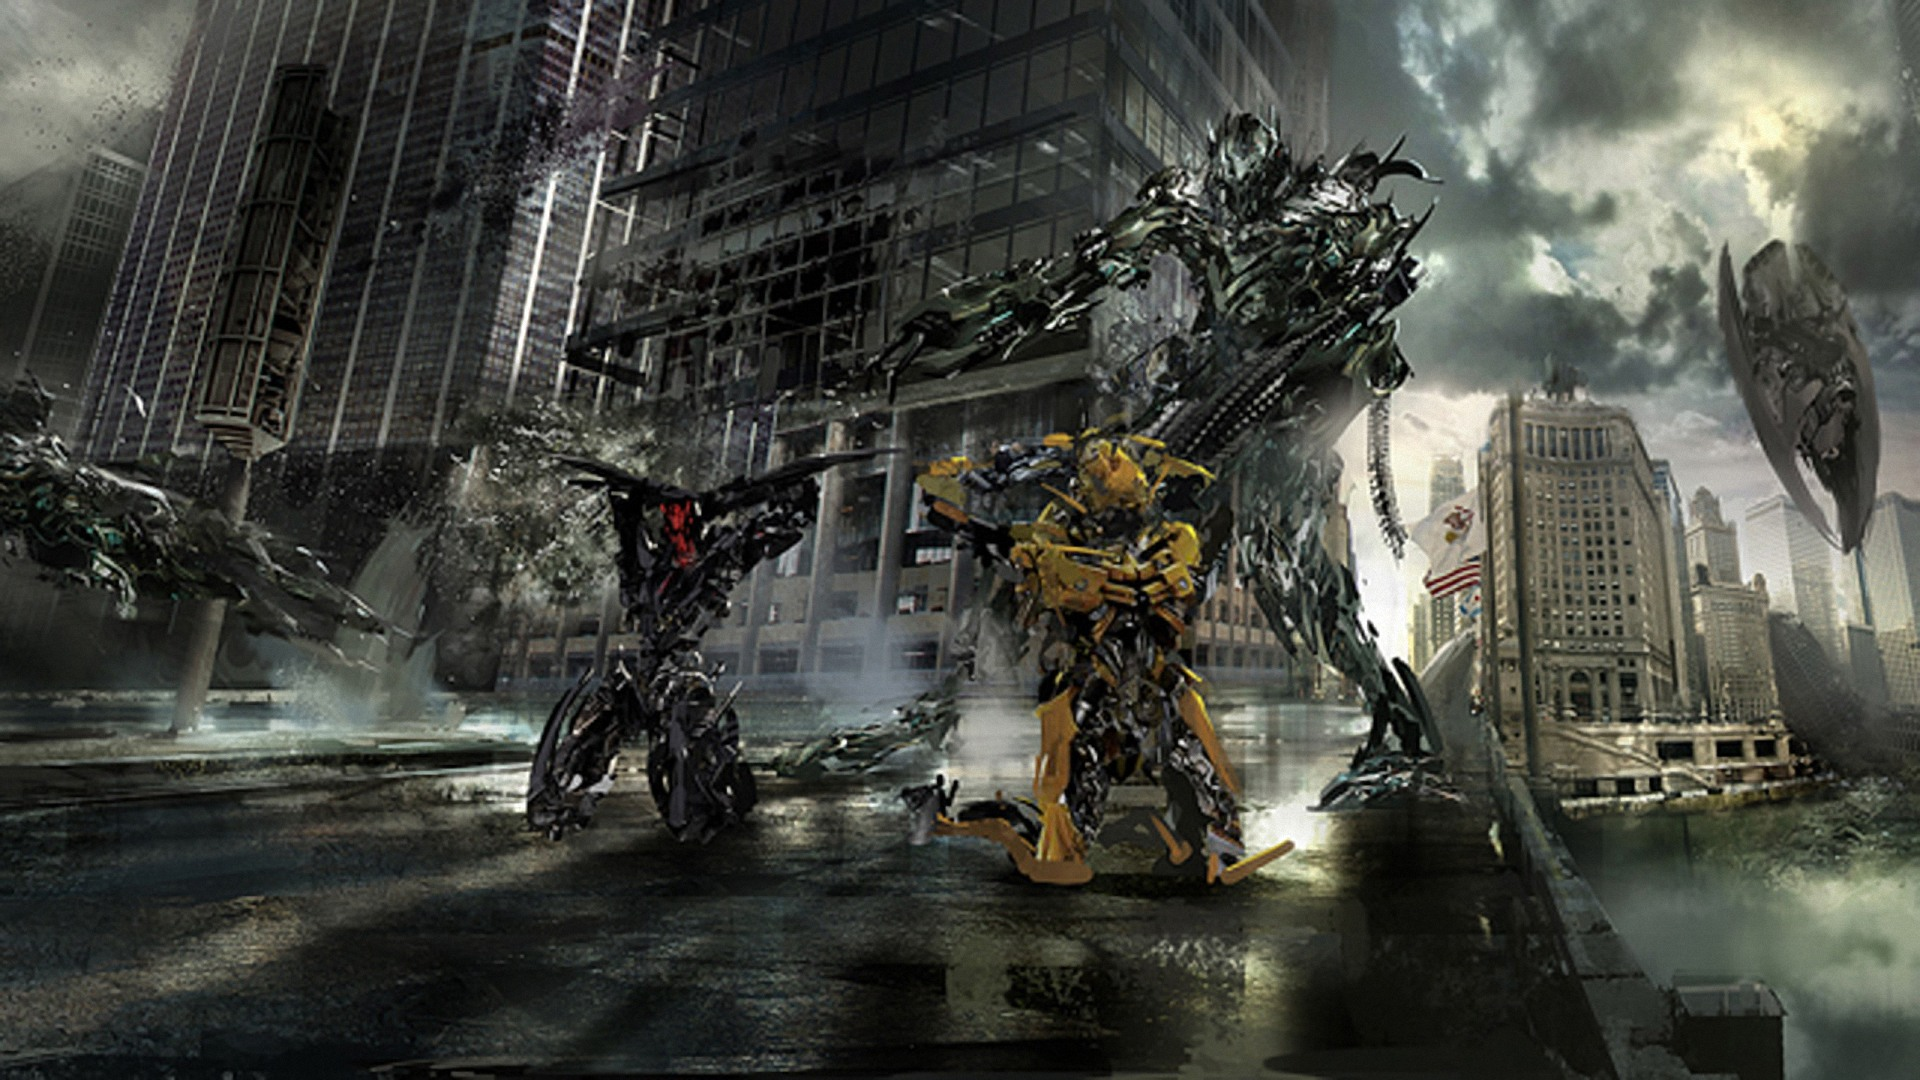 Transformers Wallpapers Hd 1920x1080